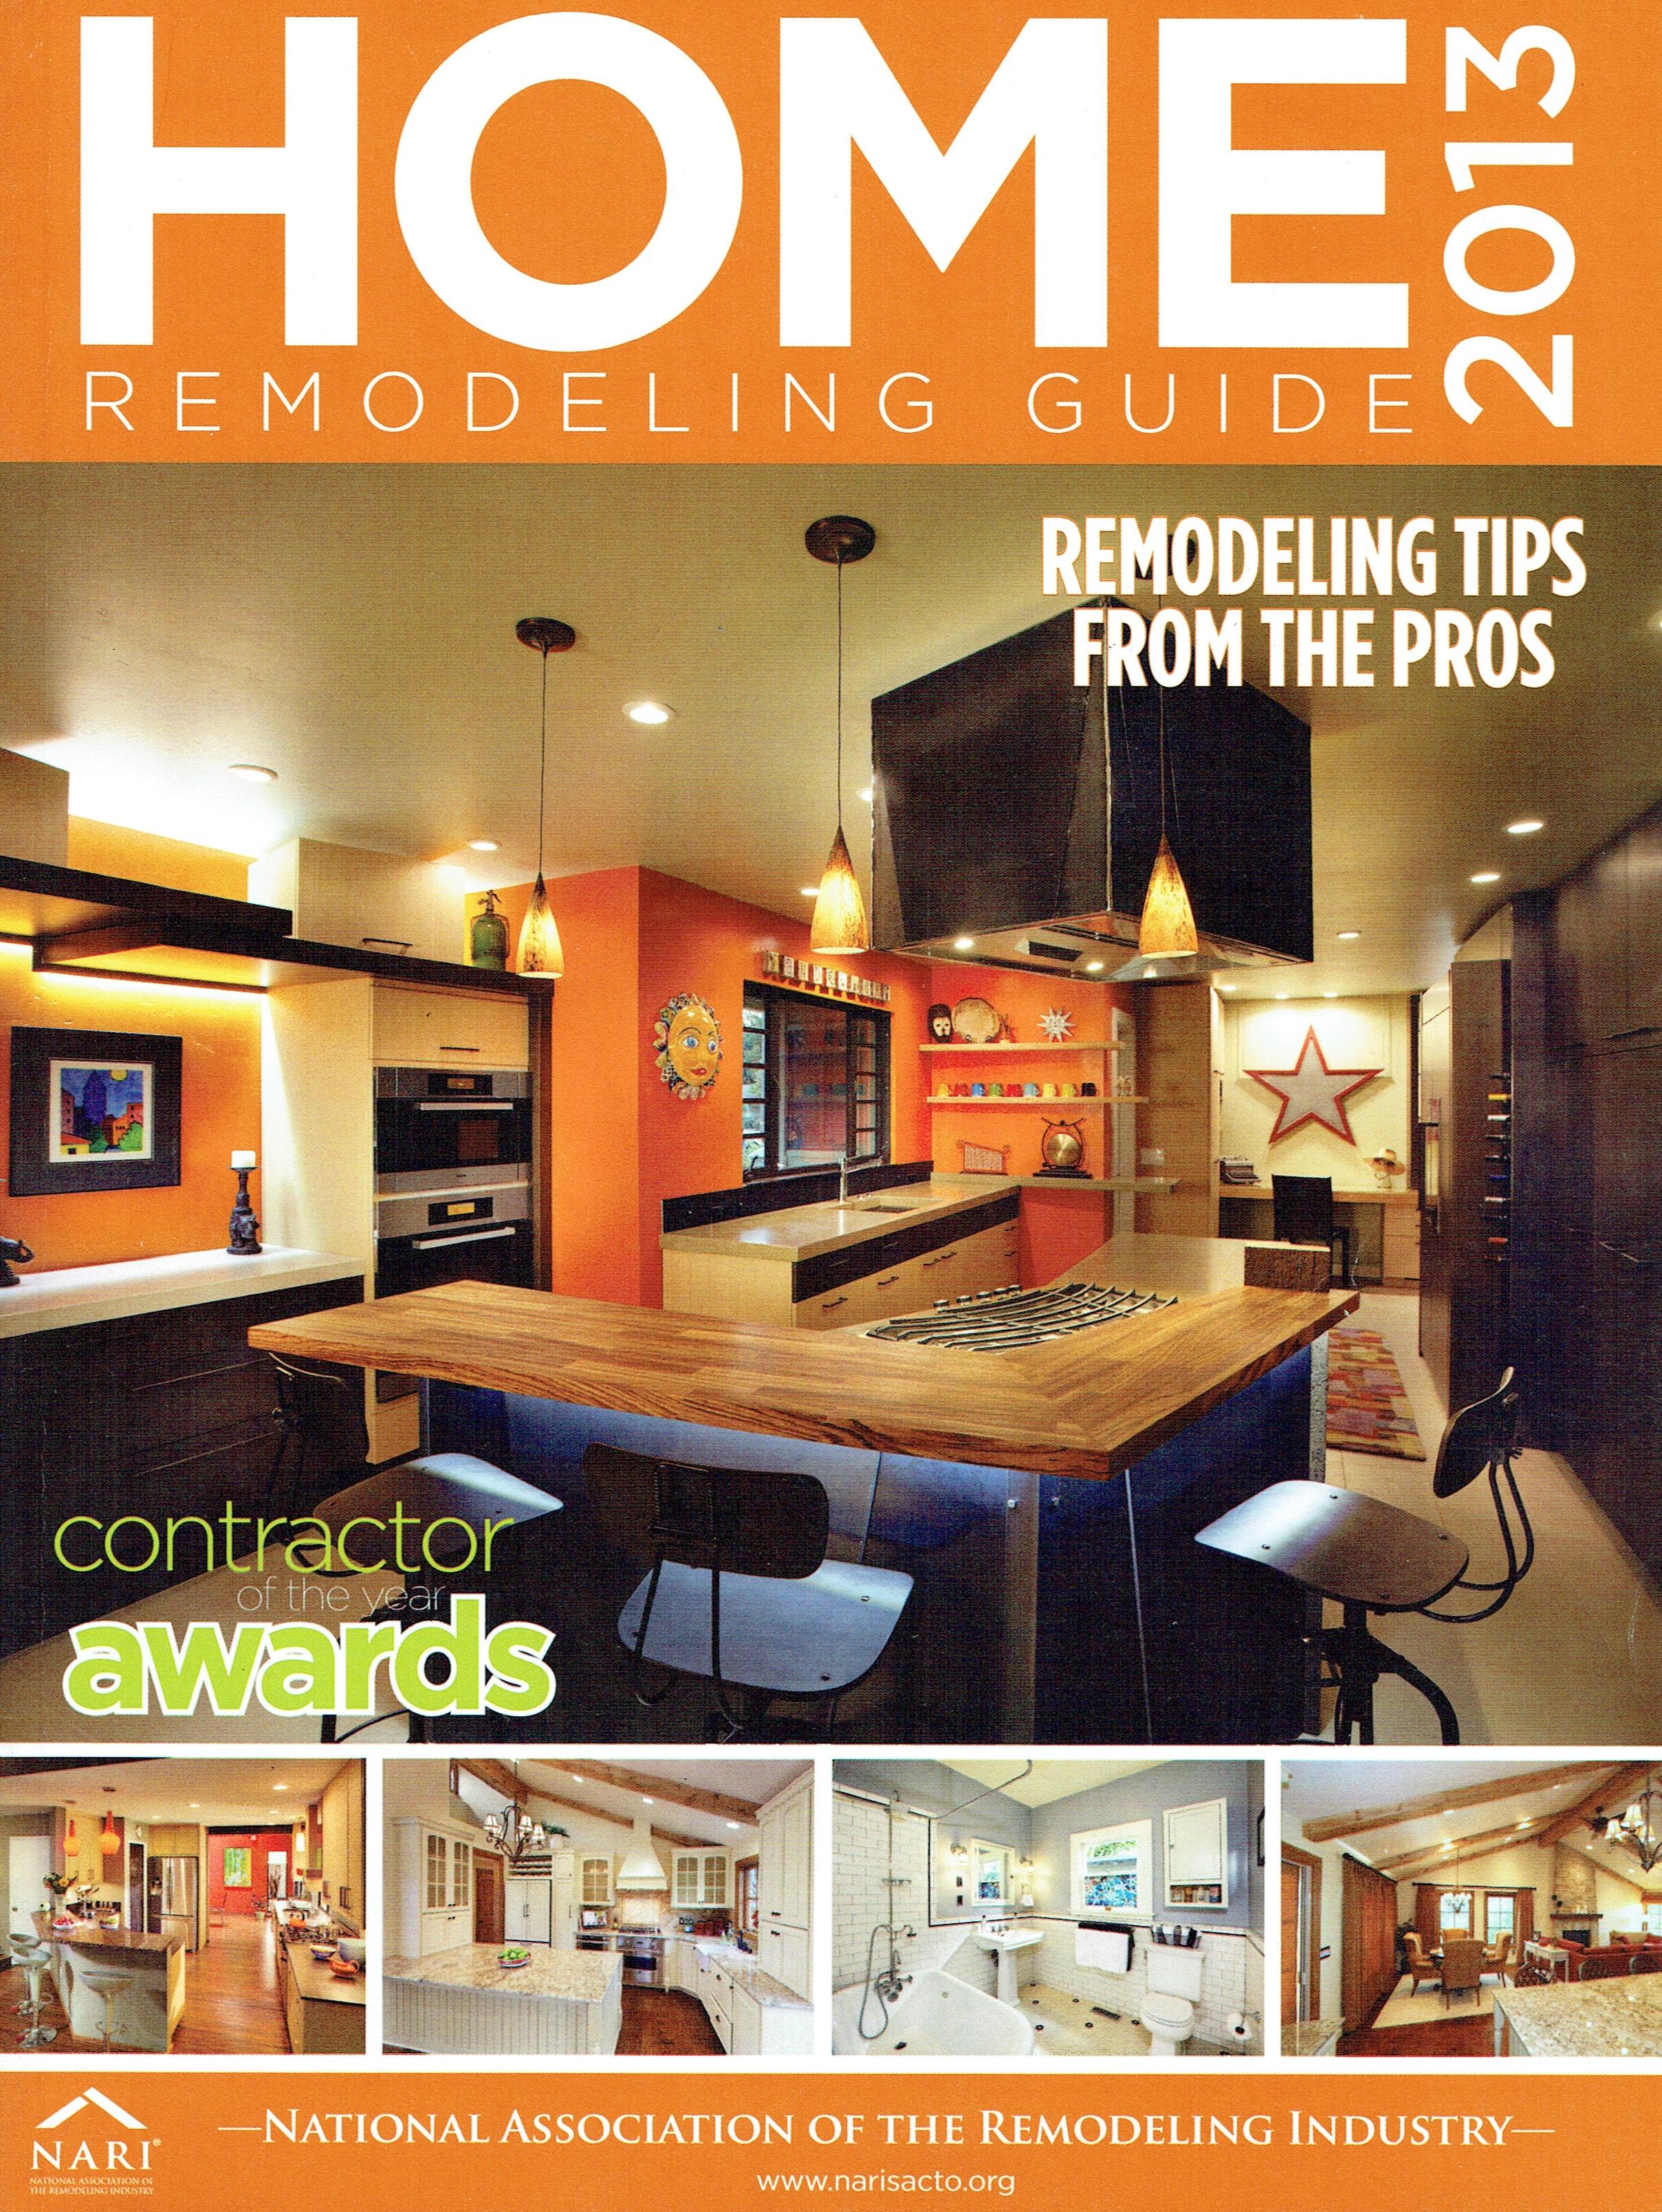 NARI Home Remodeling Guide 2013